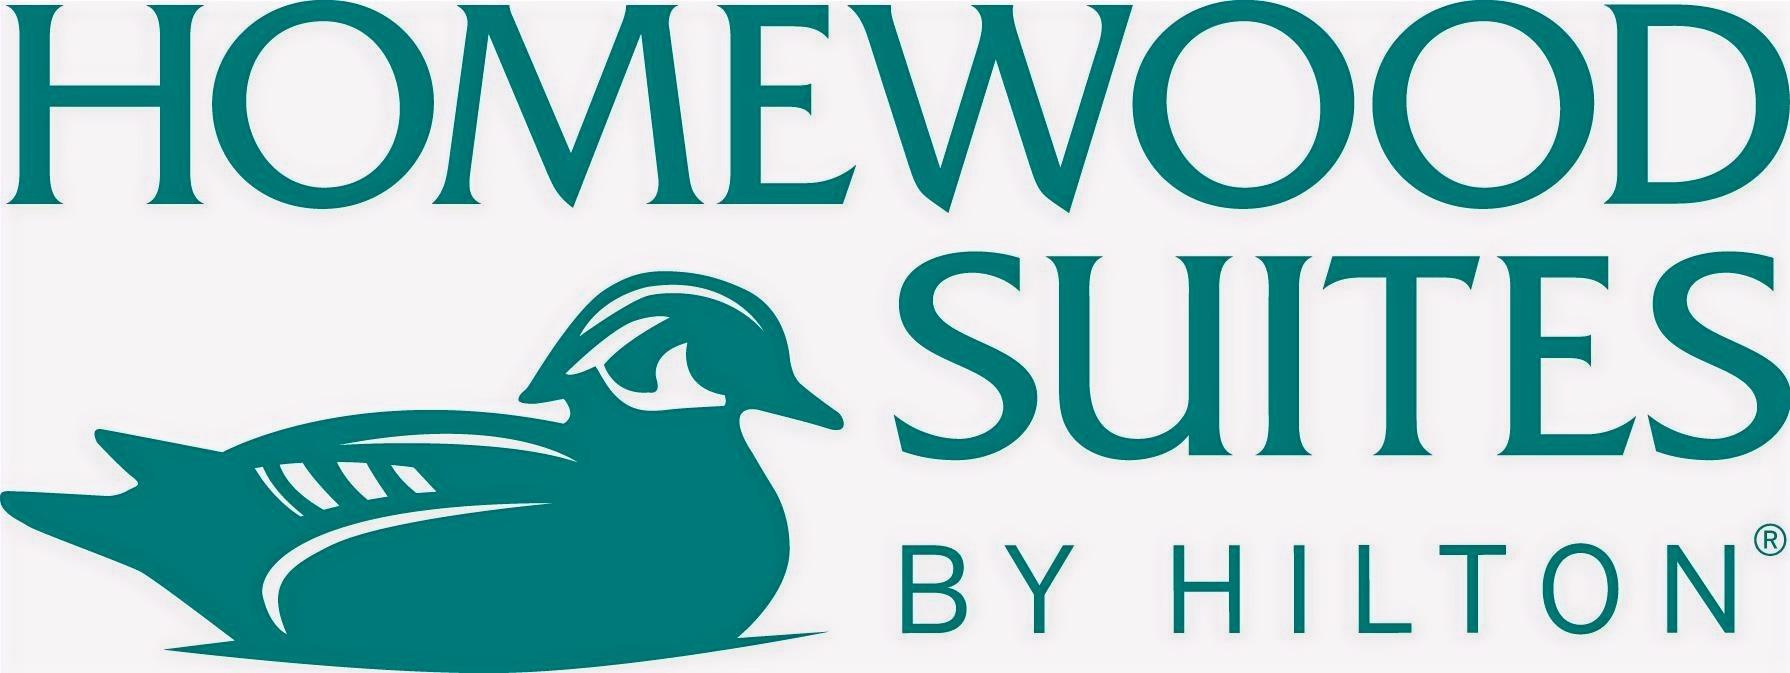 Homewood Suites Logo_edited